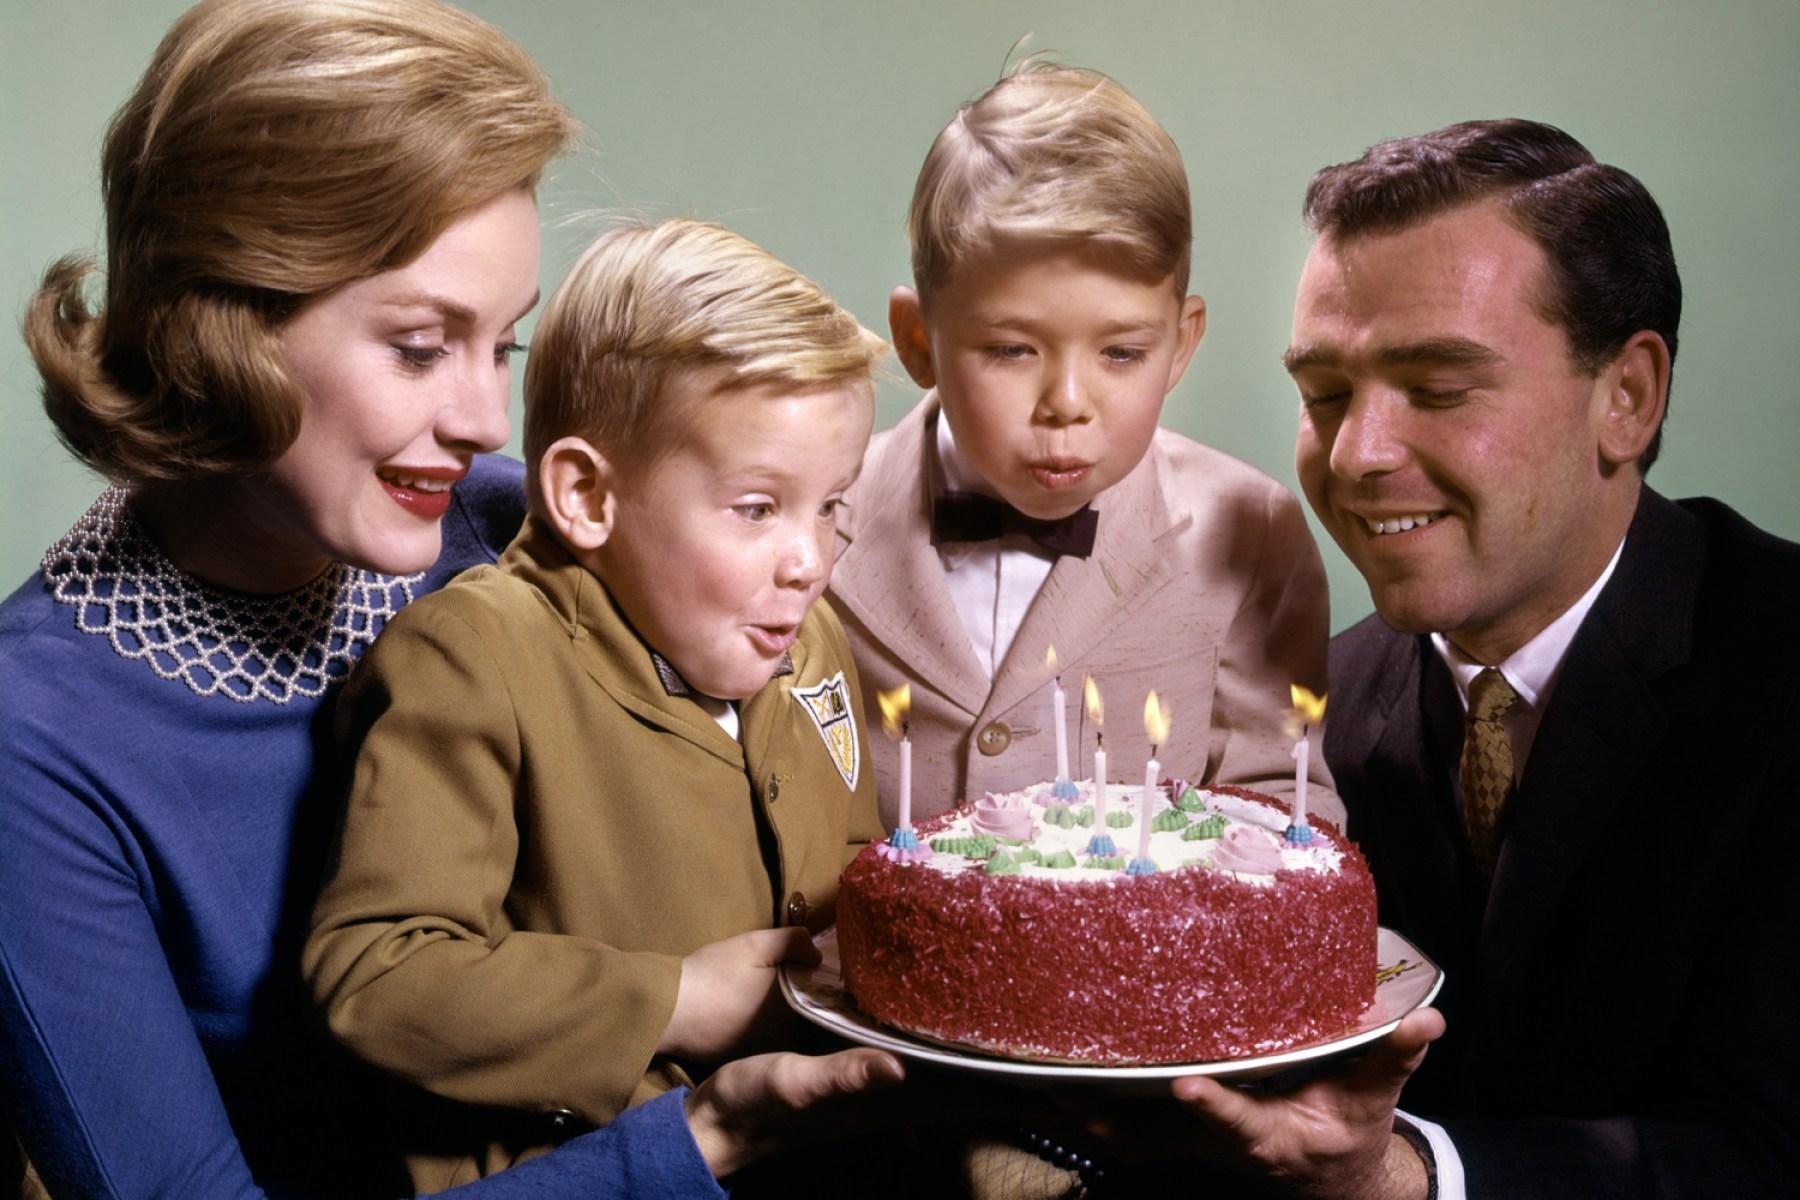 Enjoyable Happy Birthday To You Copyright Deemed Invalid Rolling Stone Funny Birthday Cards Online Bapapcheapnameinfo